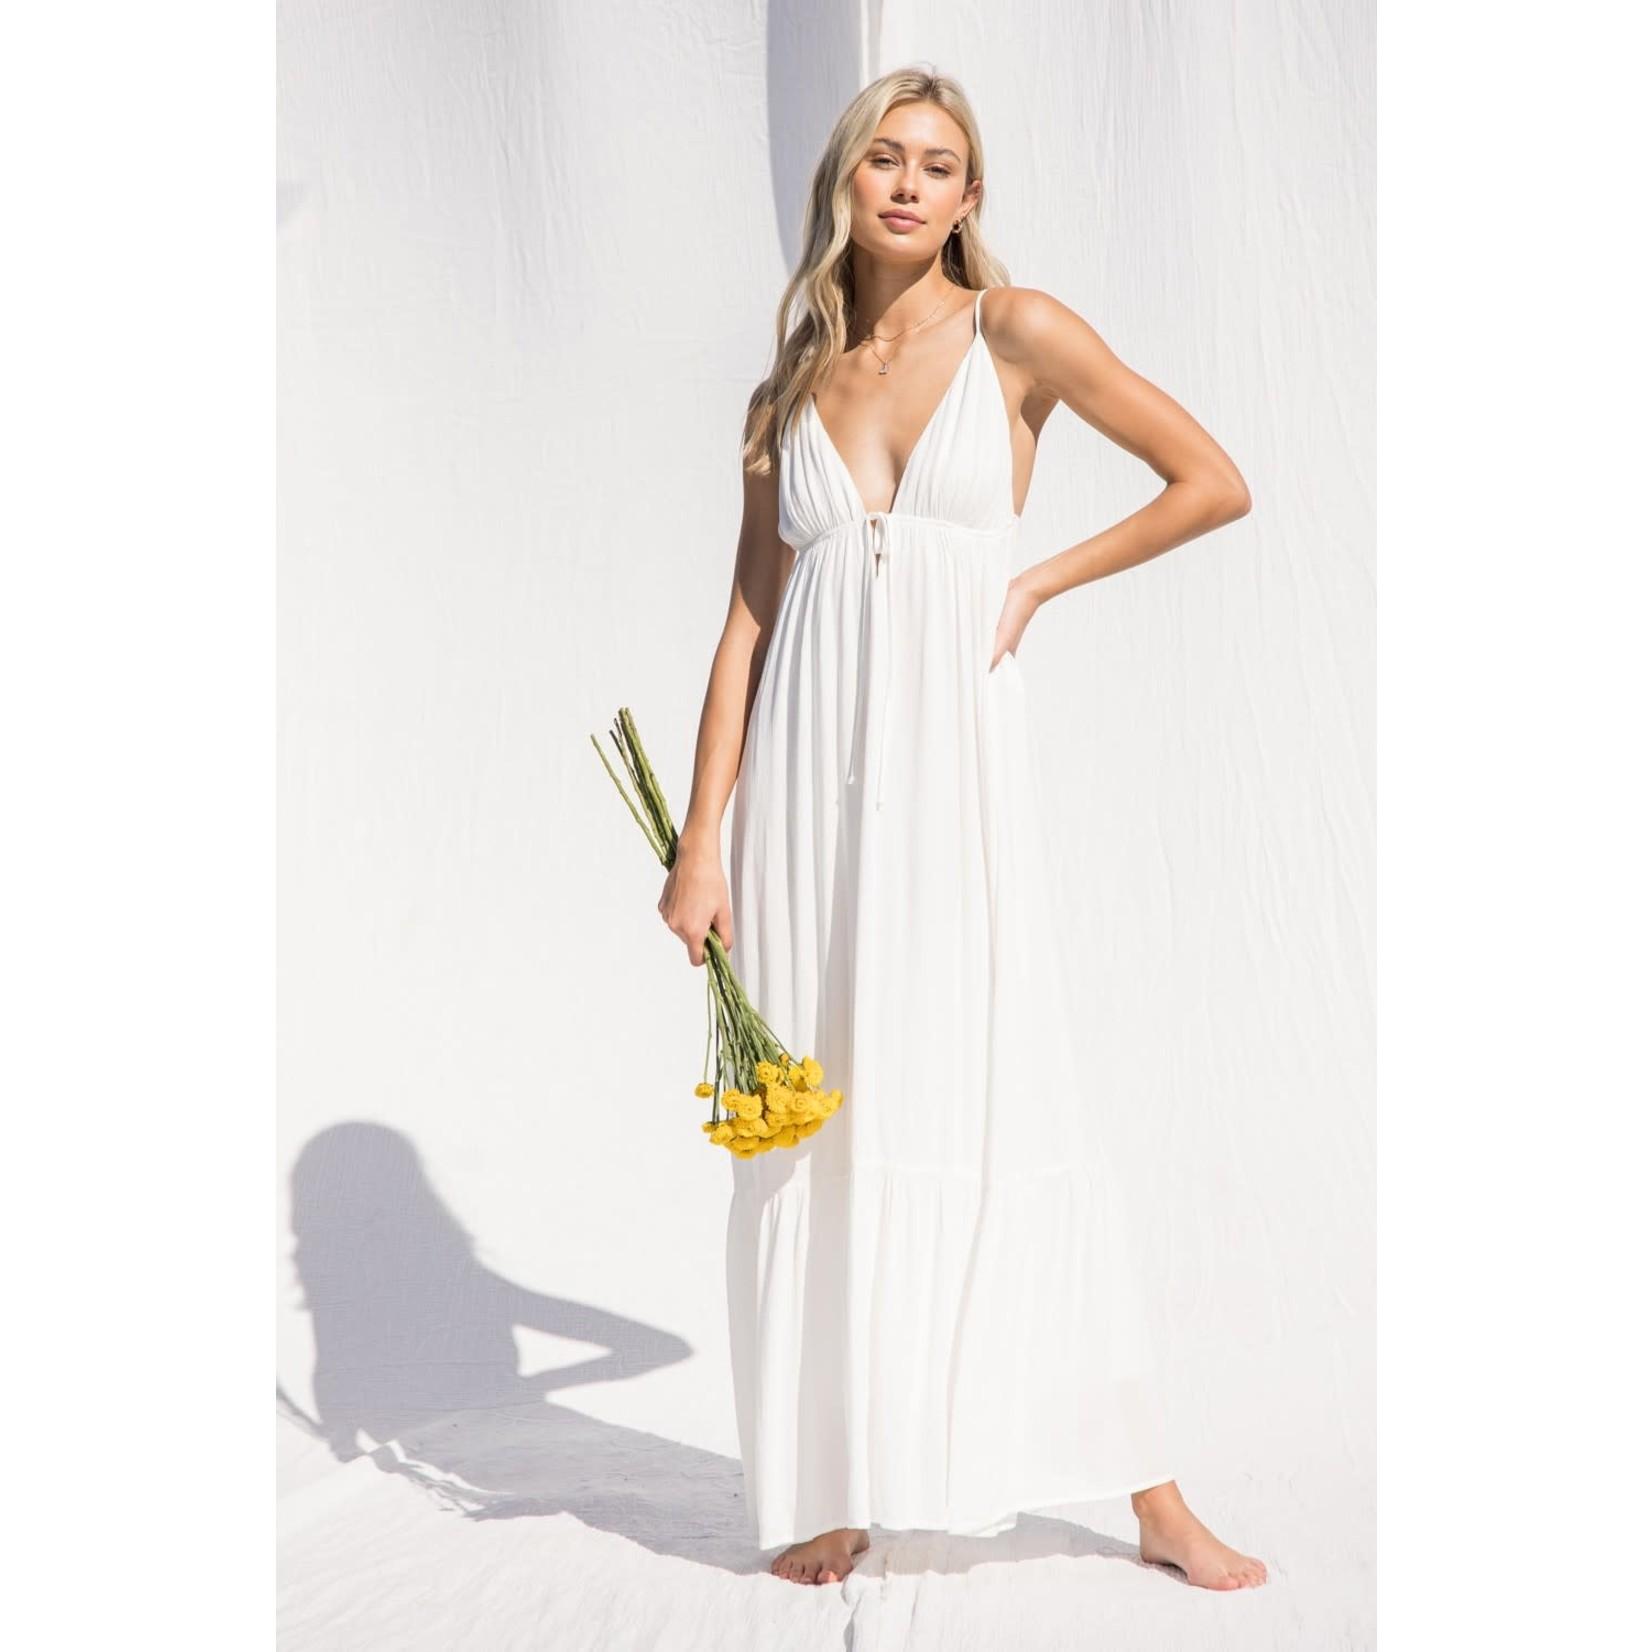 EM & ELLE Cayman Maxi Dress